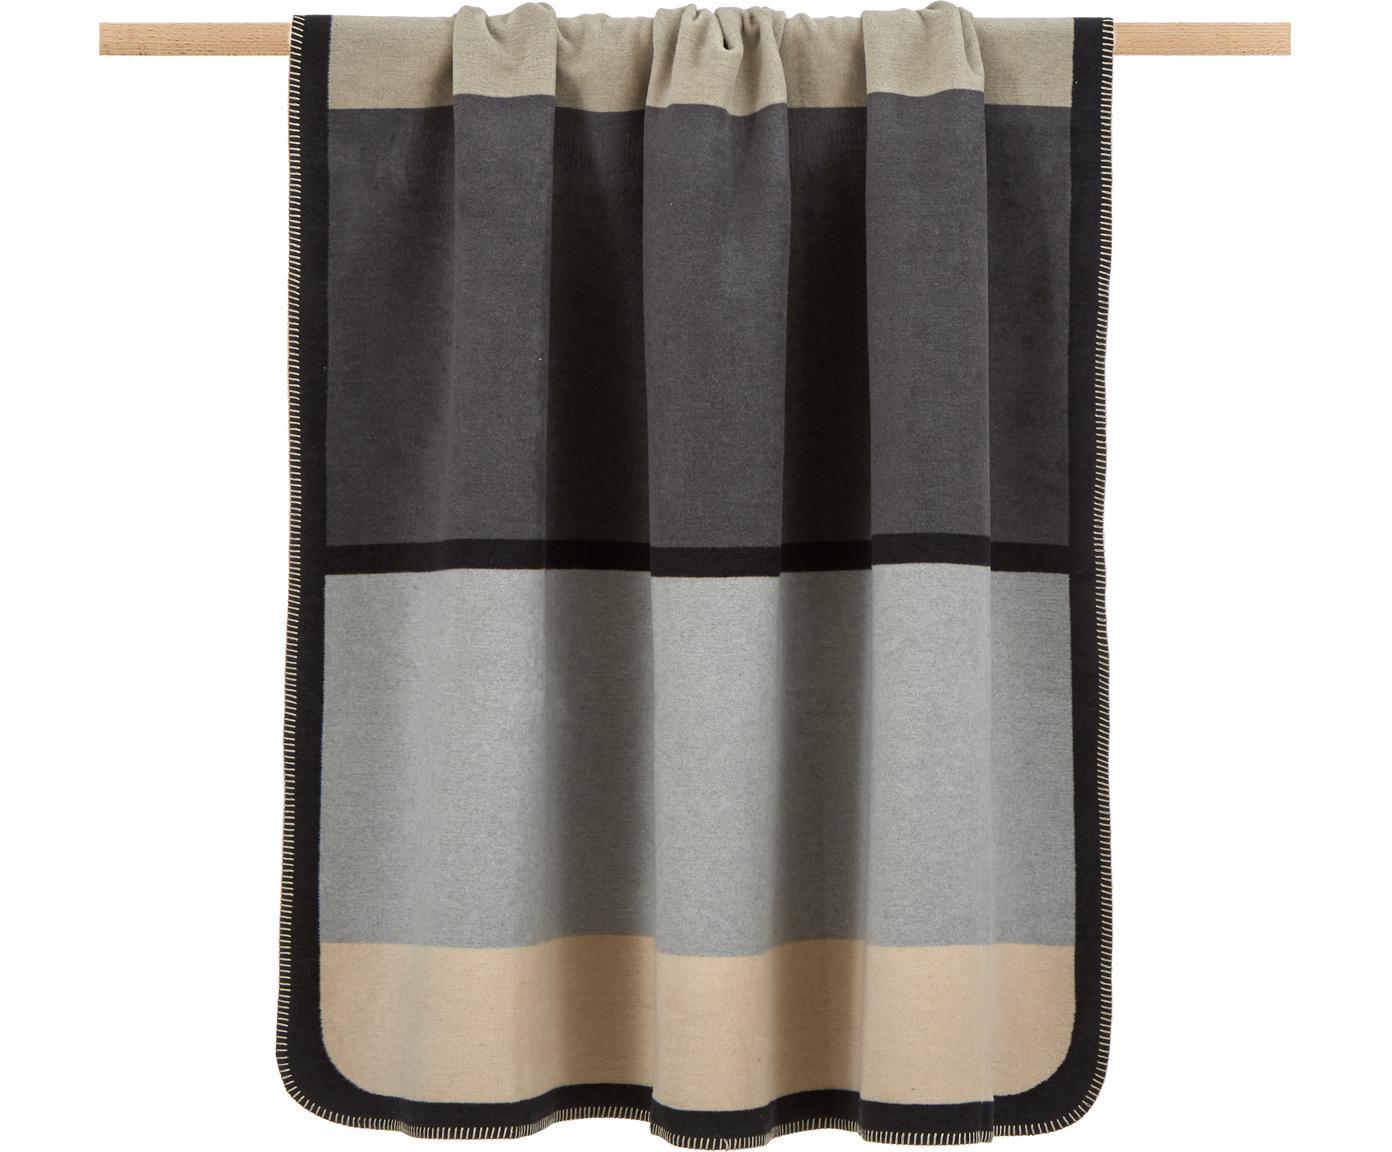 Manta doble cara Deux, 65%algodón, 35%poliacrílico, Gris, negro, beige, An 150 x L 200 cm